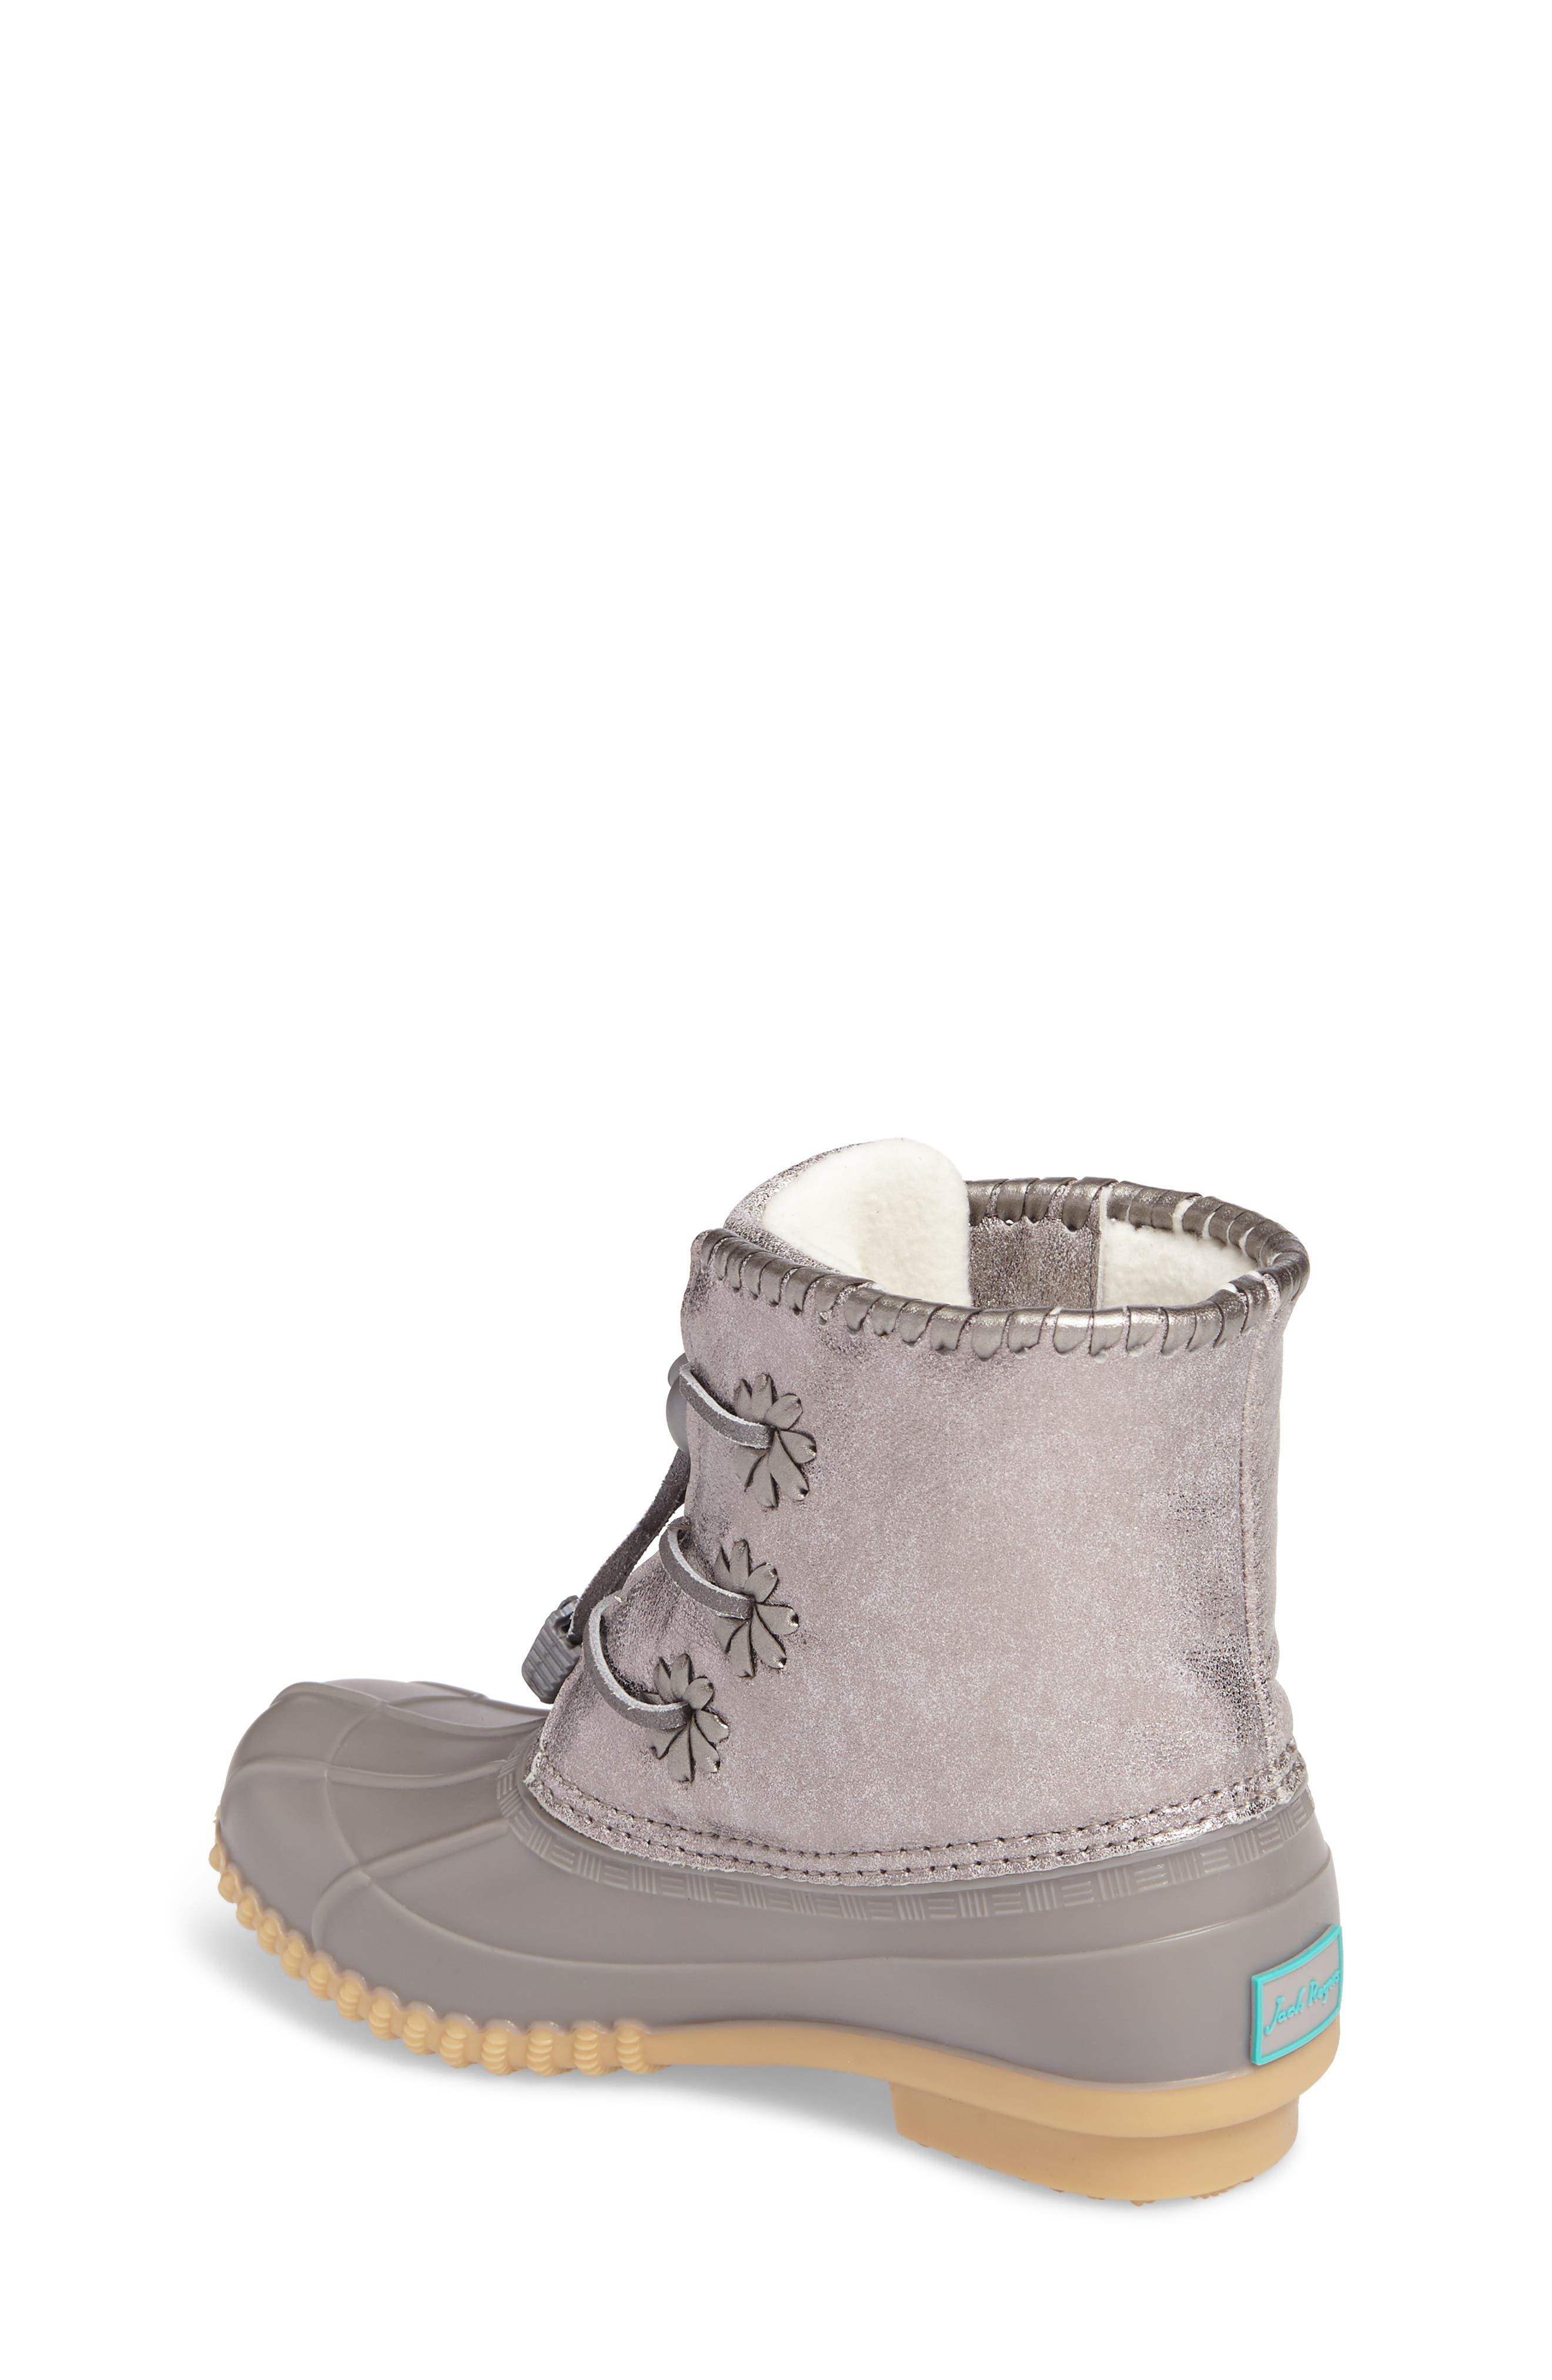 Alternate Image 3  - Jack Rogers Miss Chloe Metallic Rain Boot (Toddler, Little Kid & Big Kid)